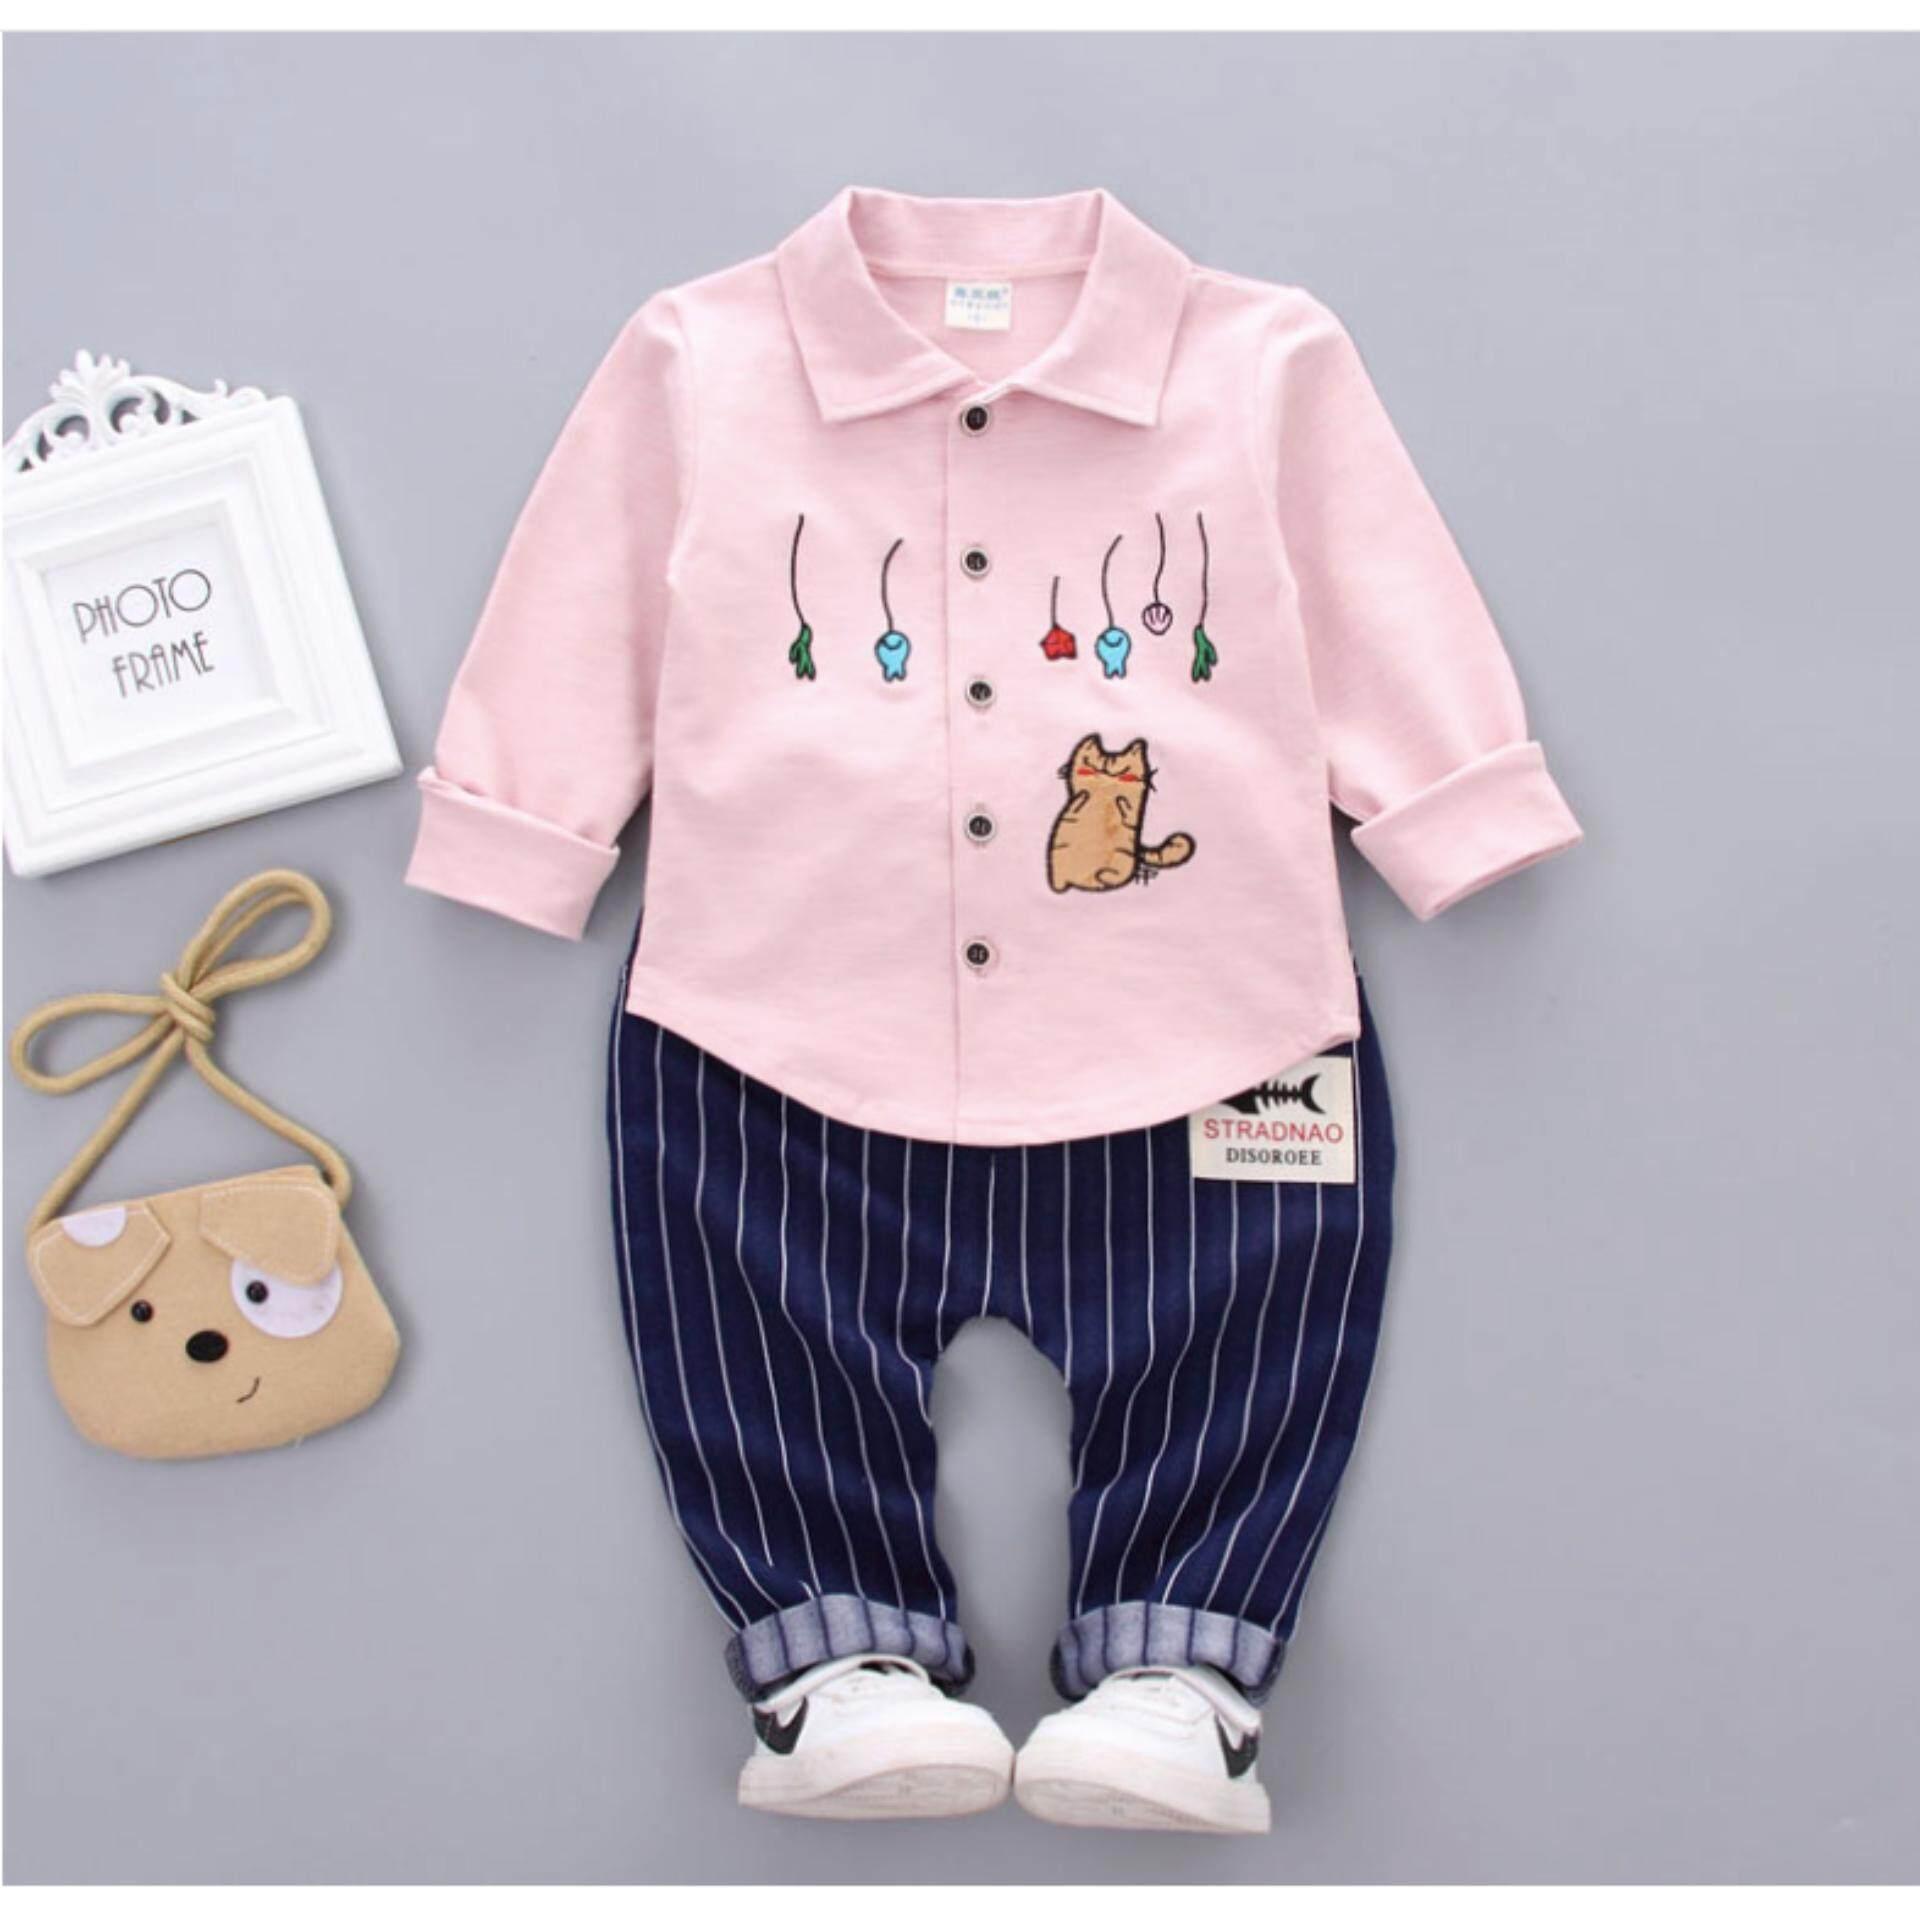 2017 new fashion spring autumn baby boys shirt trousers clothing set kids children boys clothing suit